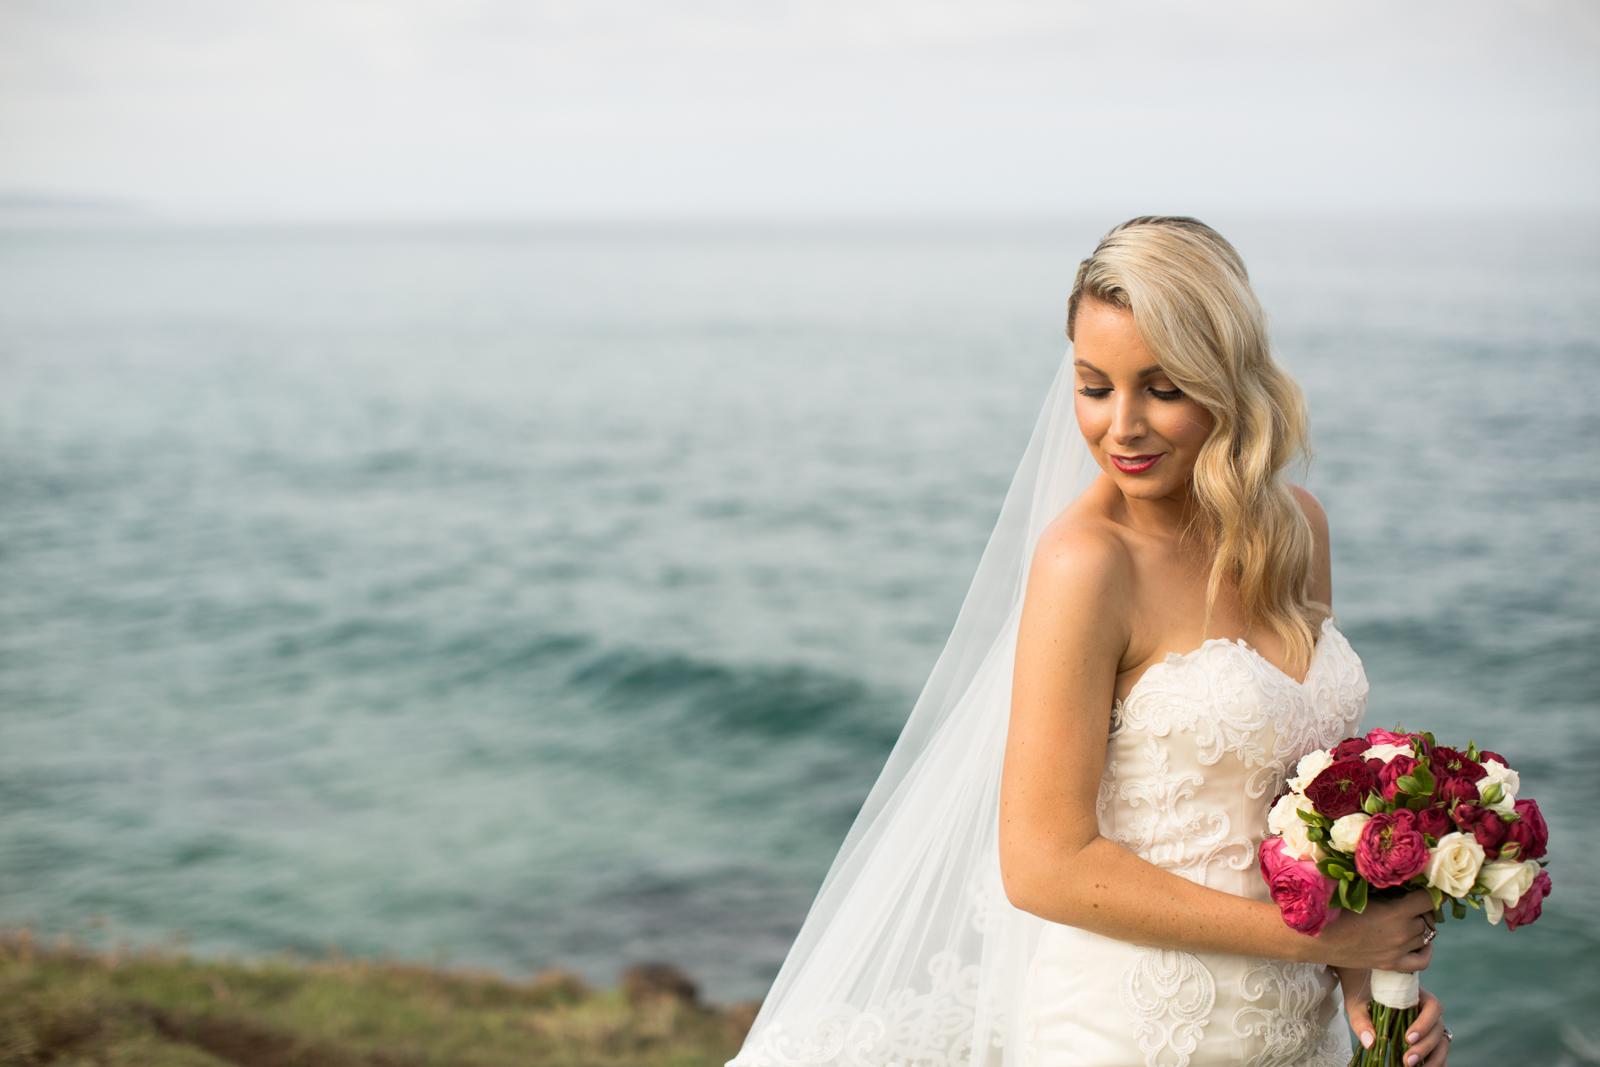 13Bec_Kilpatrick_Photography_Kate_and_Elliot_Ballina_Wedding_Portraits-XXX_929422